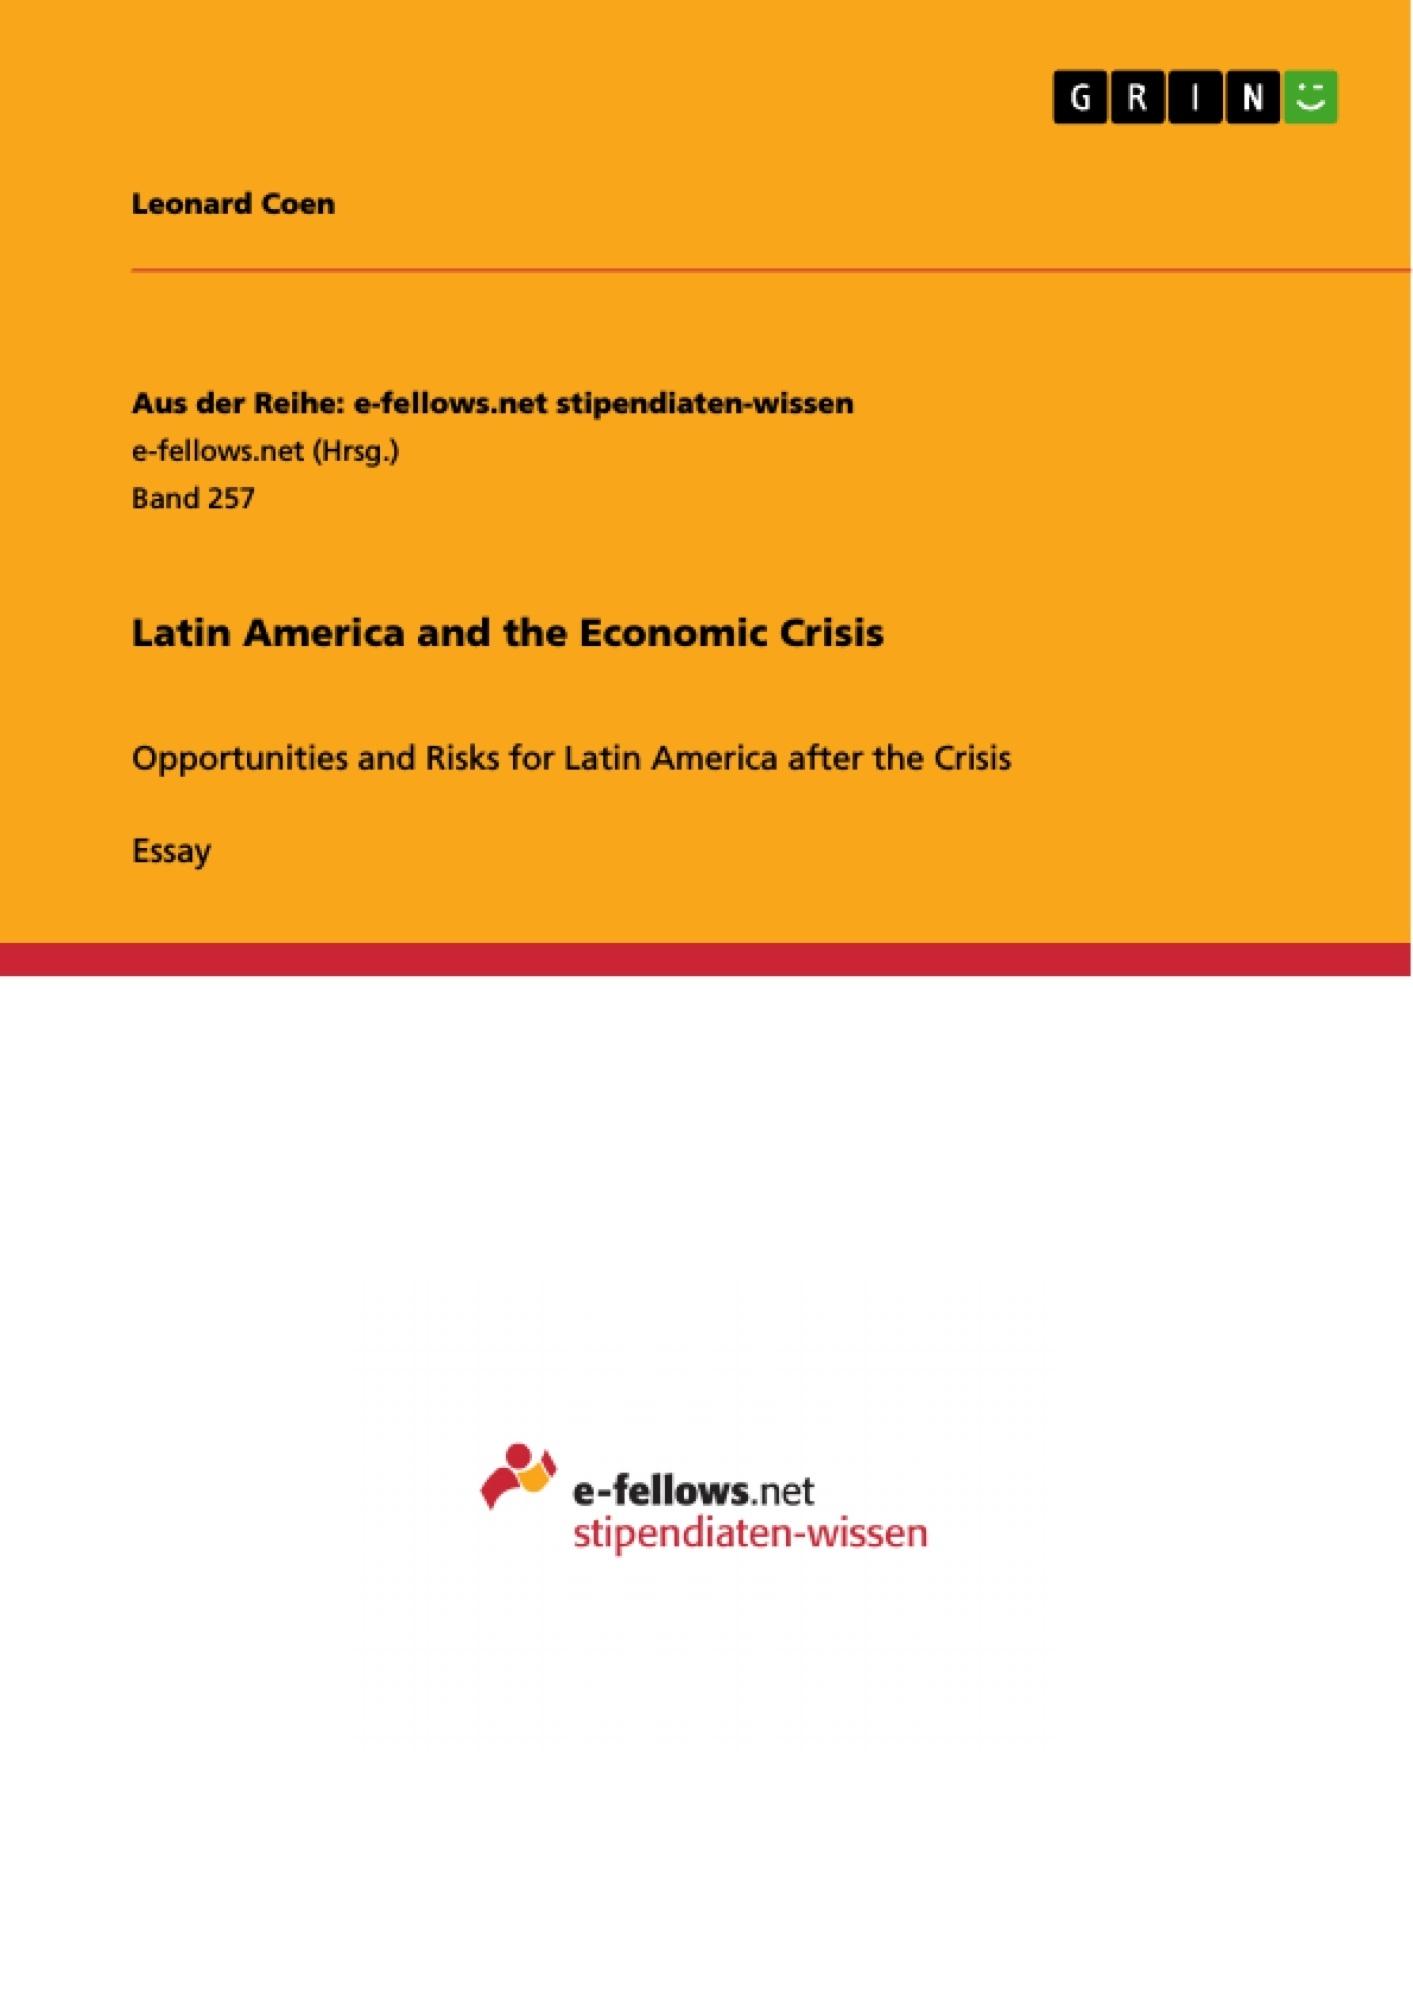 Title: Latin America and the Economic Crisis